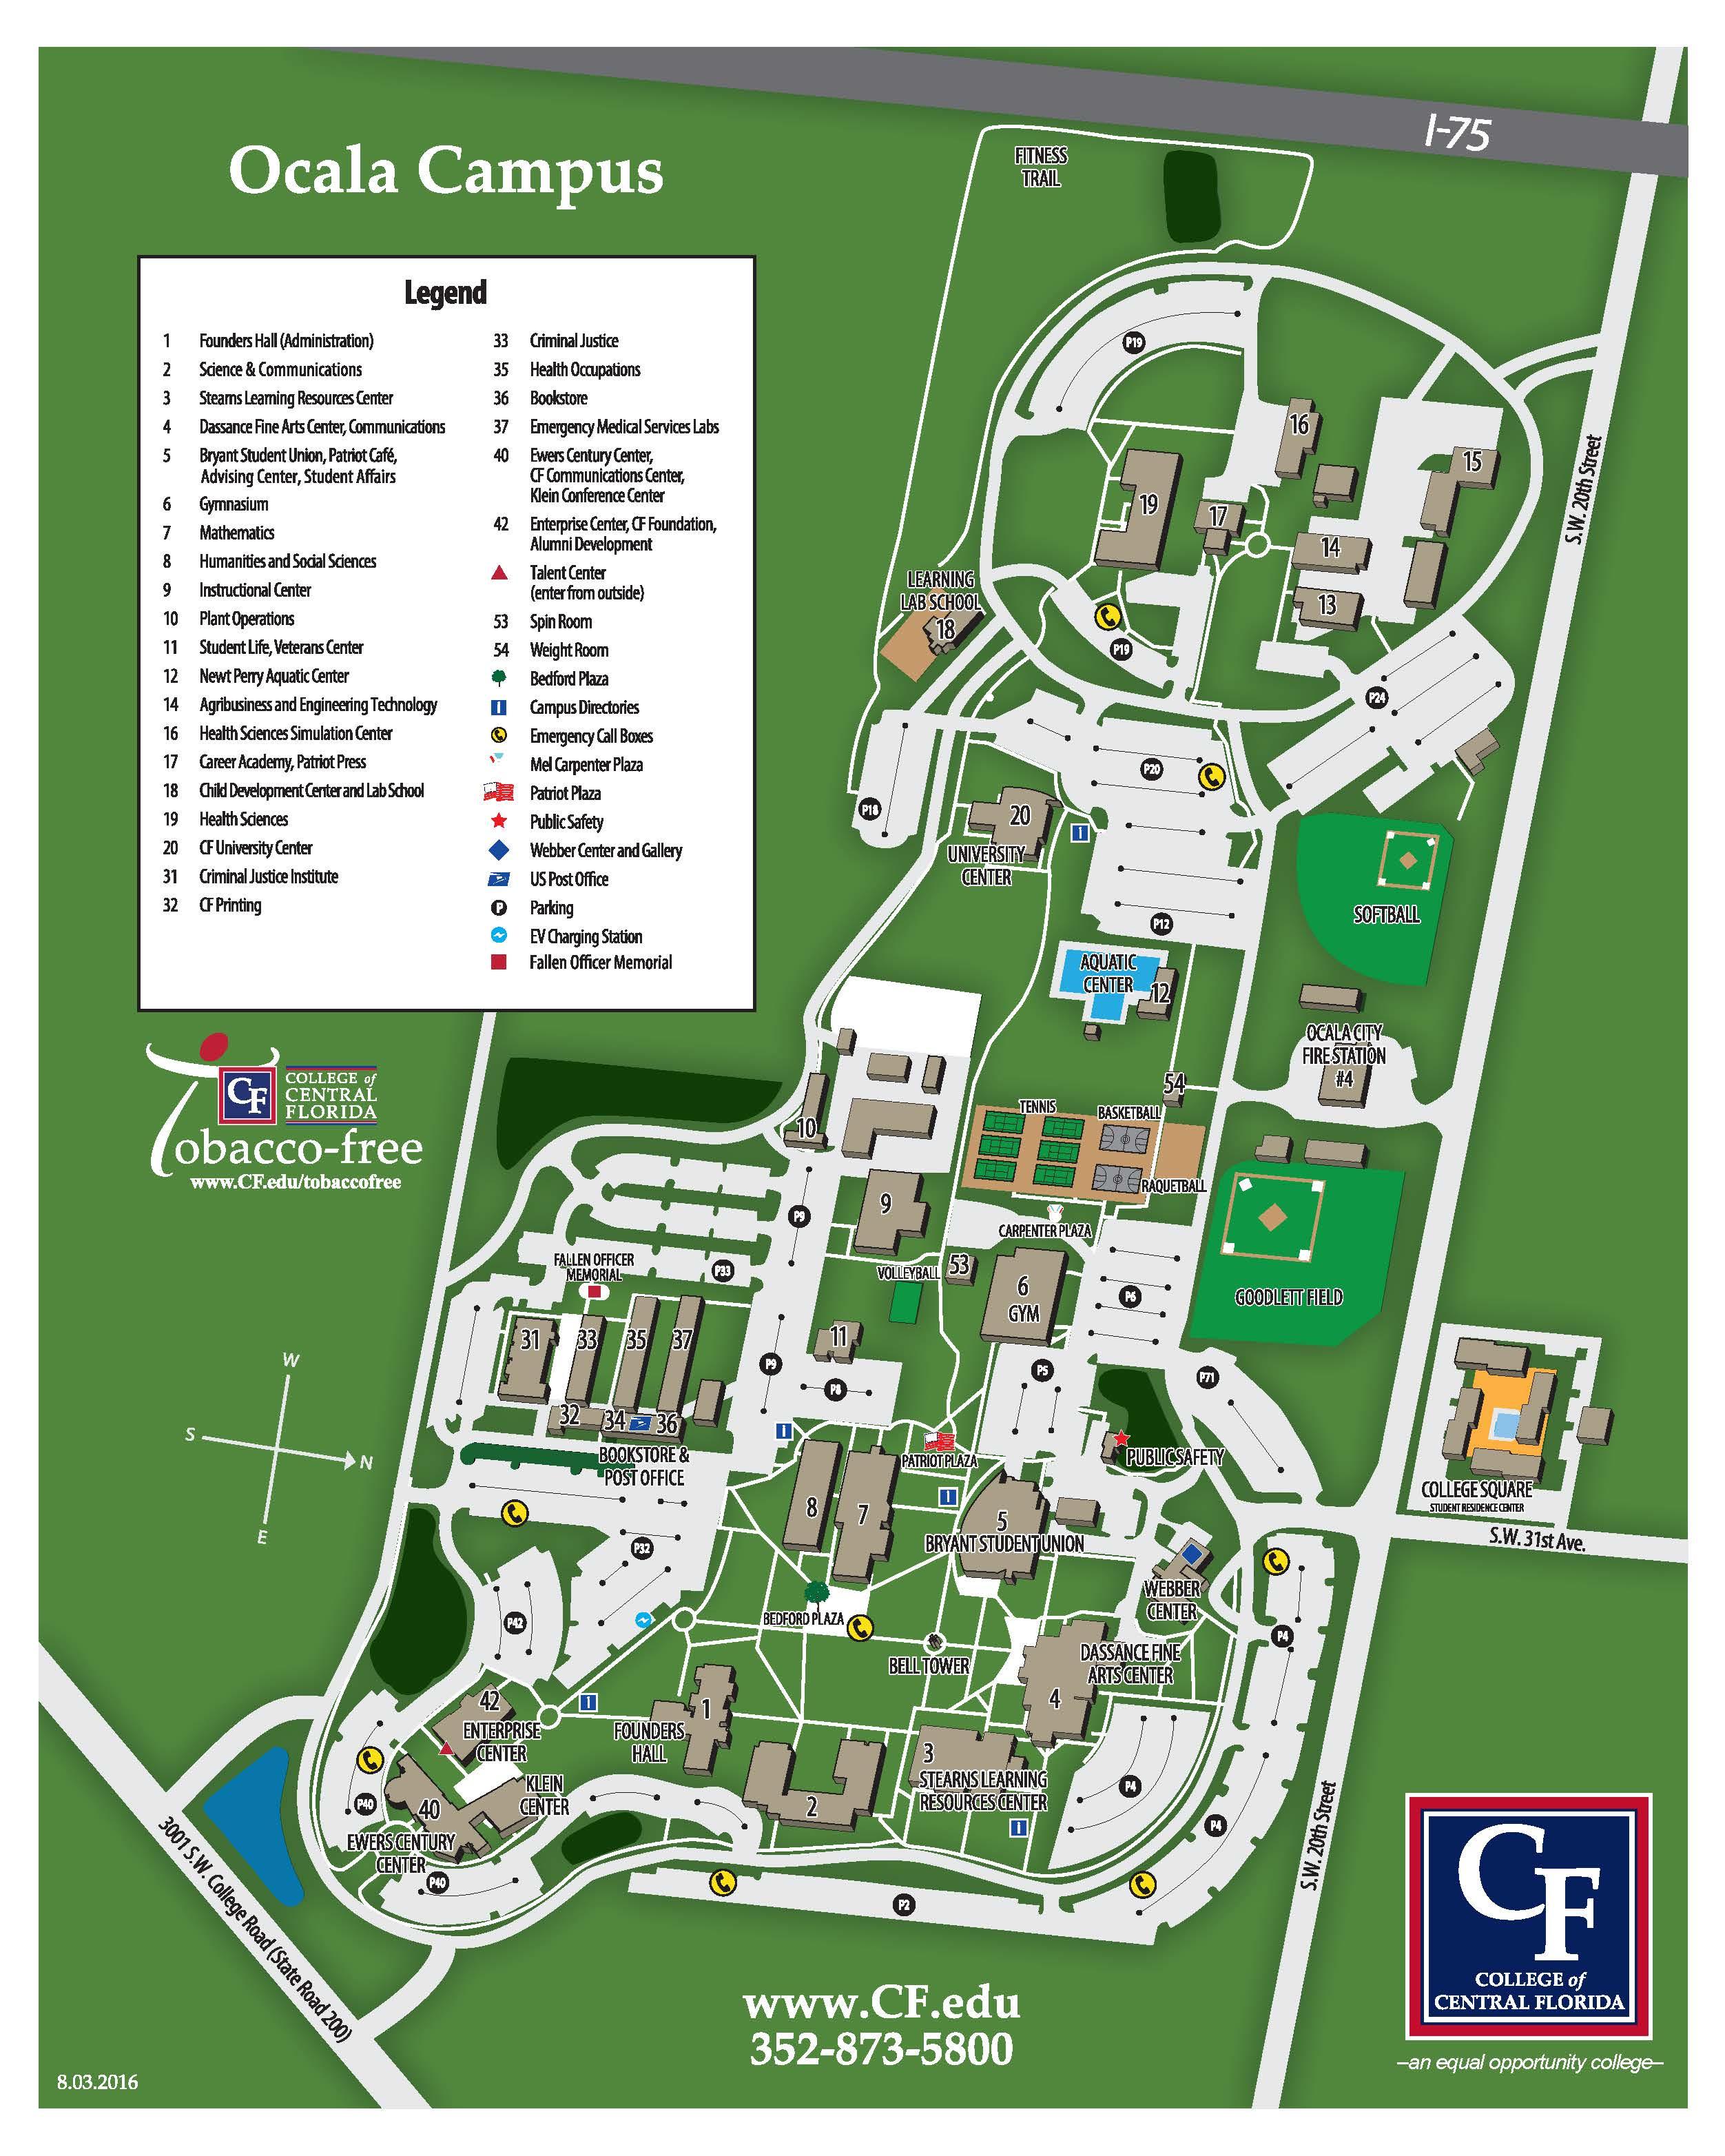 ocala campus map. college of central florida  ocala campus map